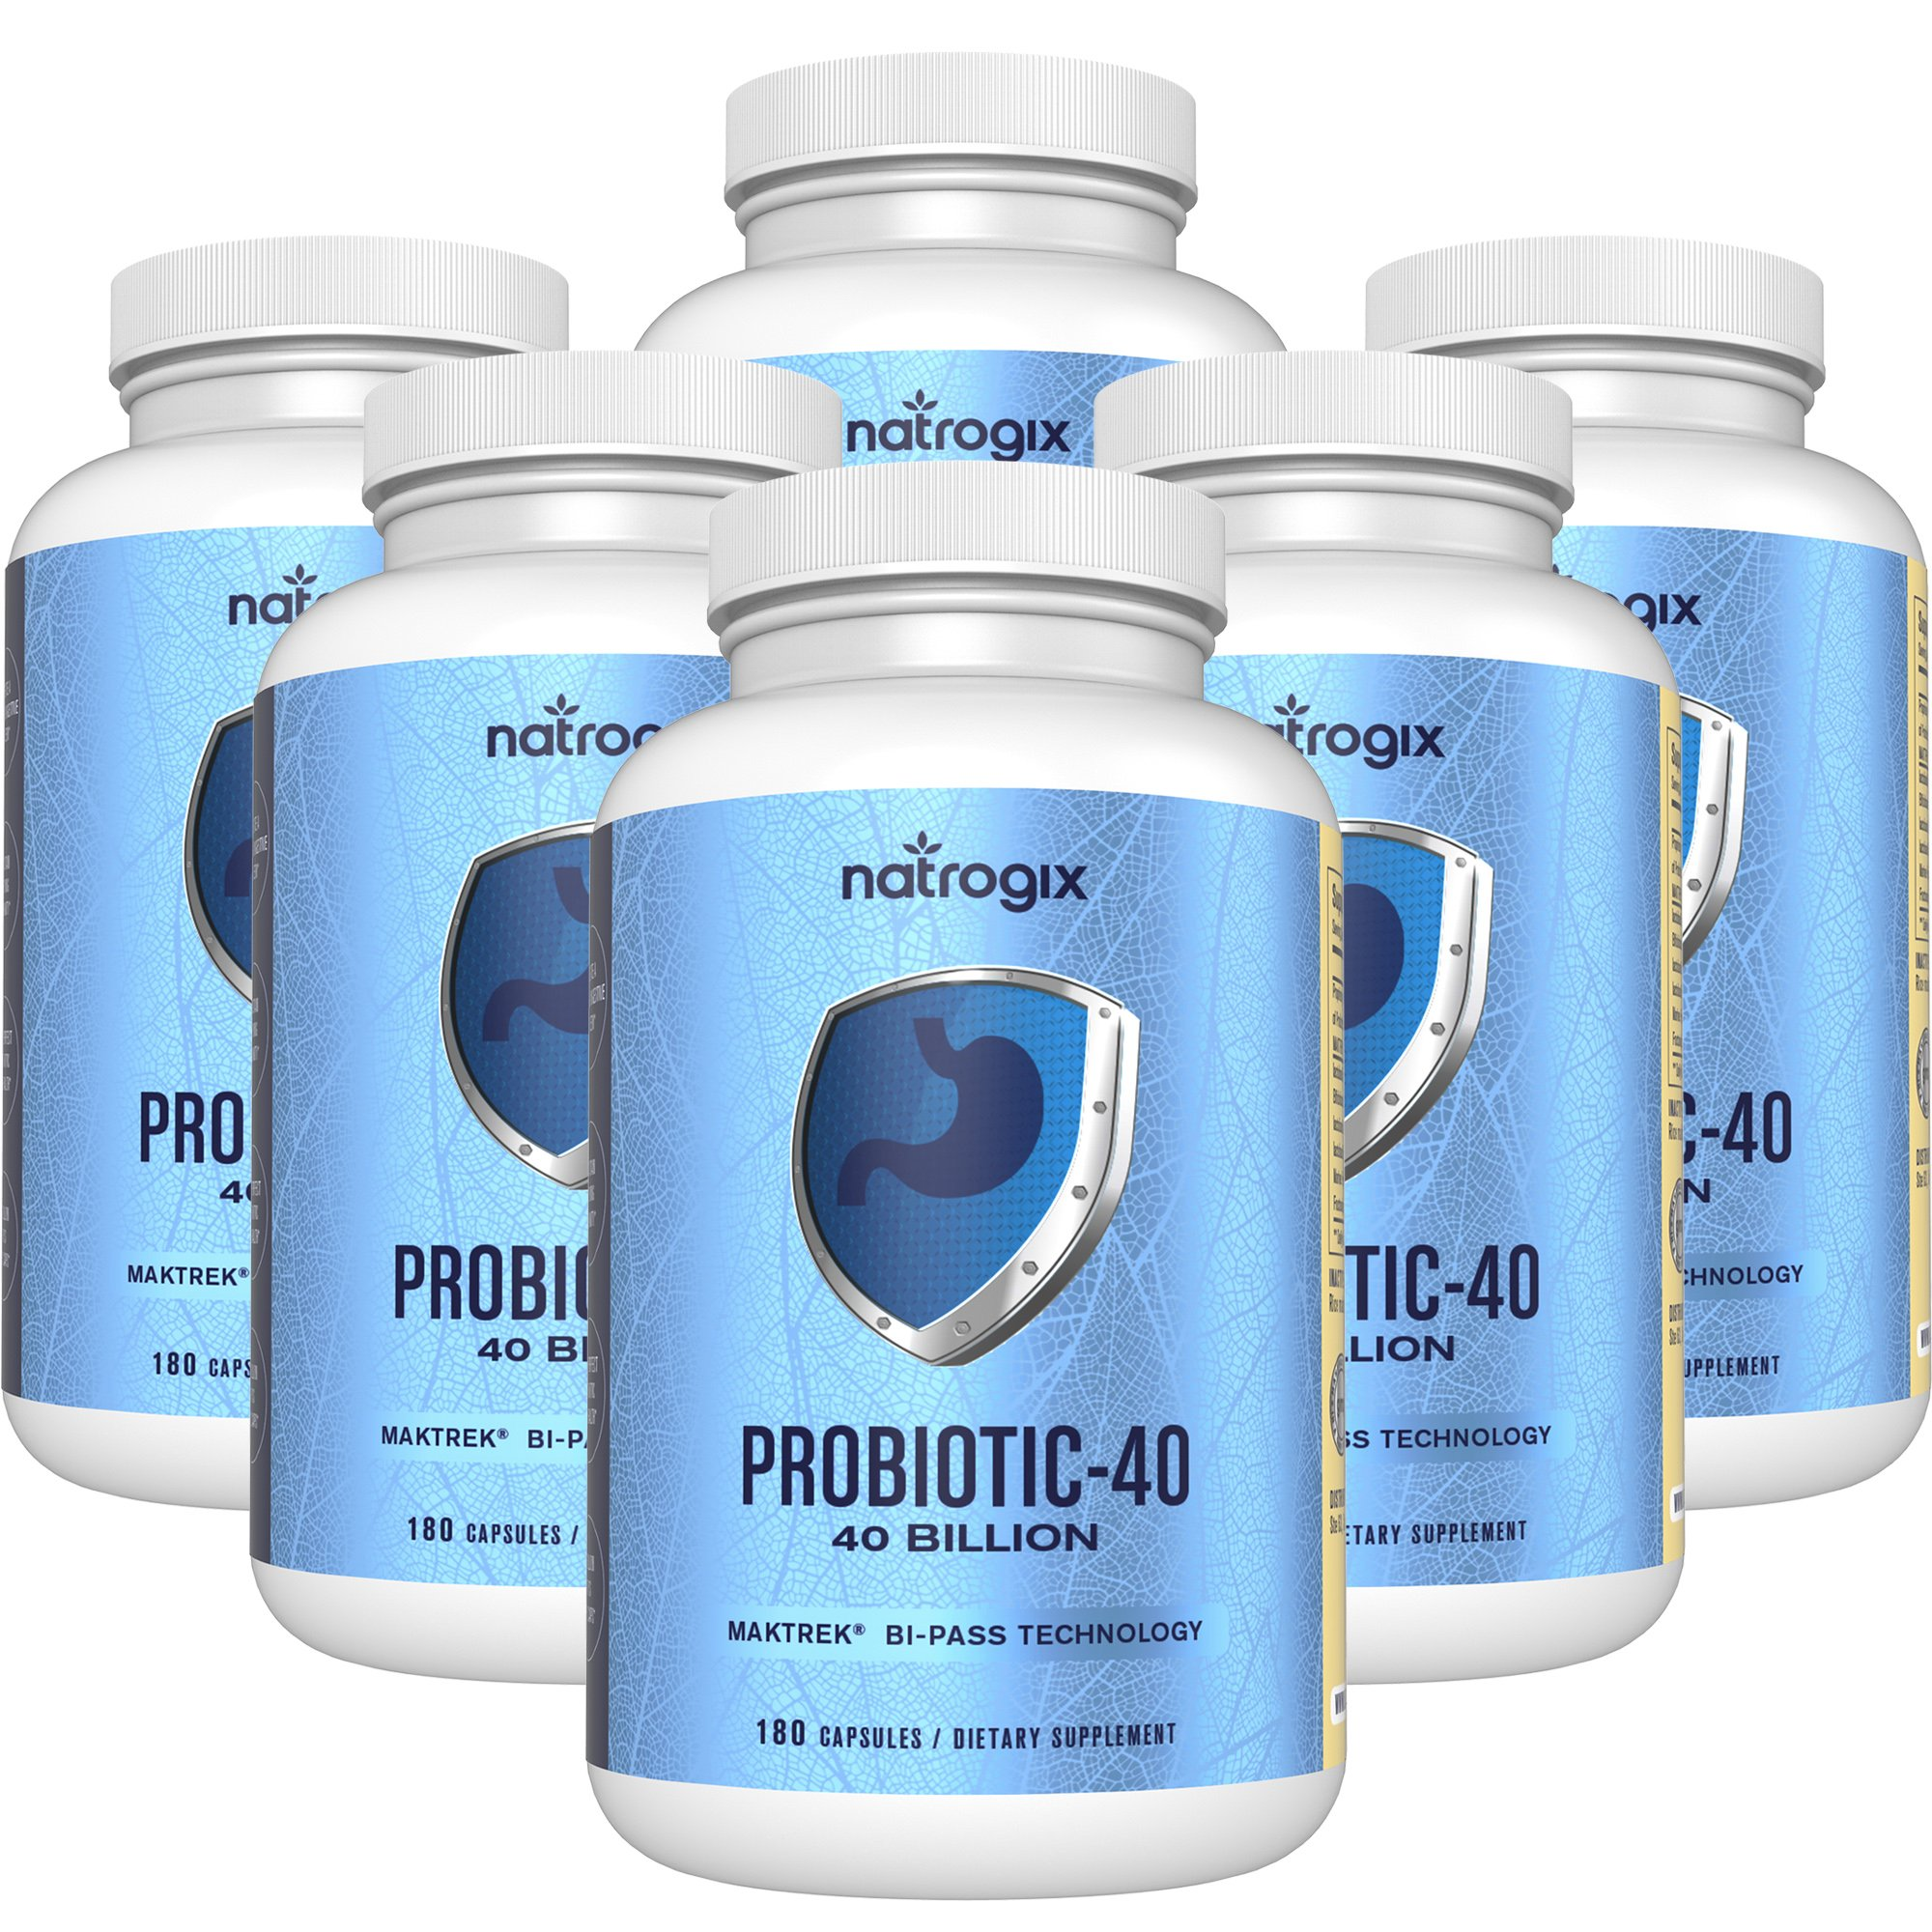 Natrogix 40 Billion Probiotics CFUs Organism Viable Probiotic, Digestive Aids with Multiple Strains of Probiotics, Digestive Health Support, Immune System Booster (180 Capsules) * (6Bottles)